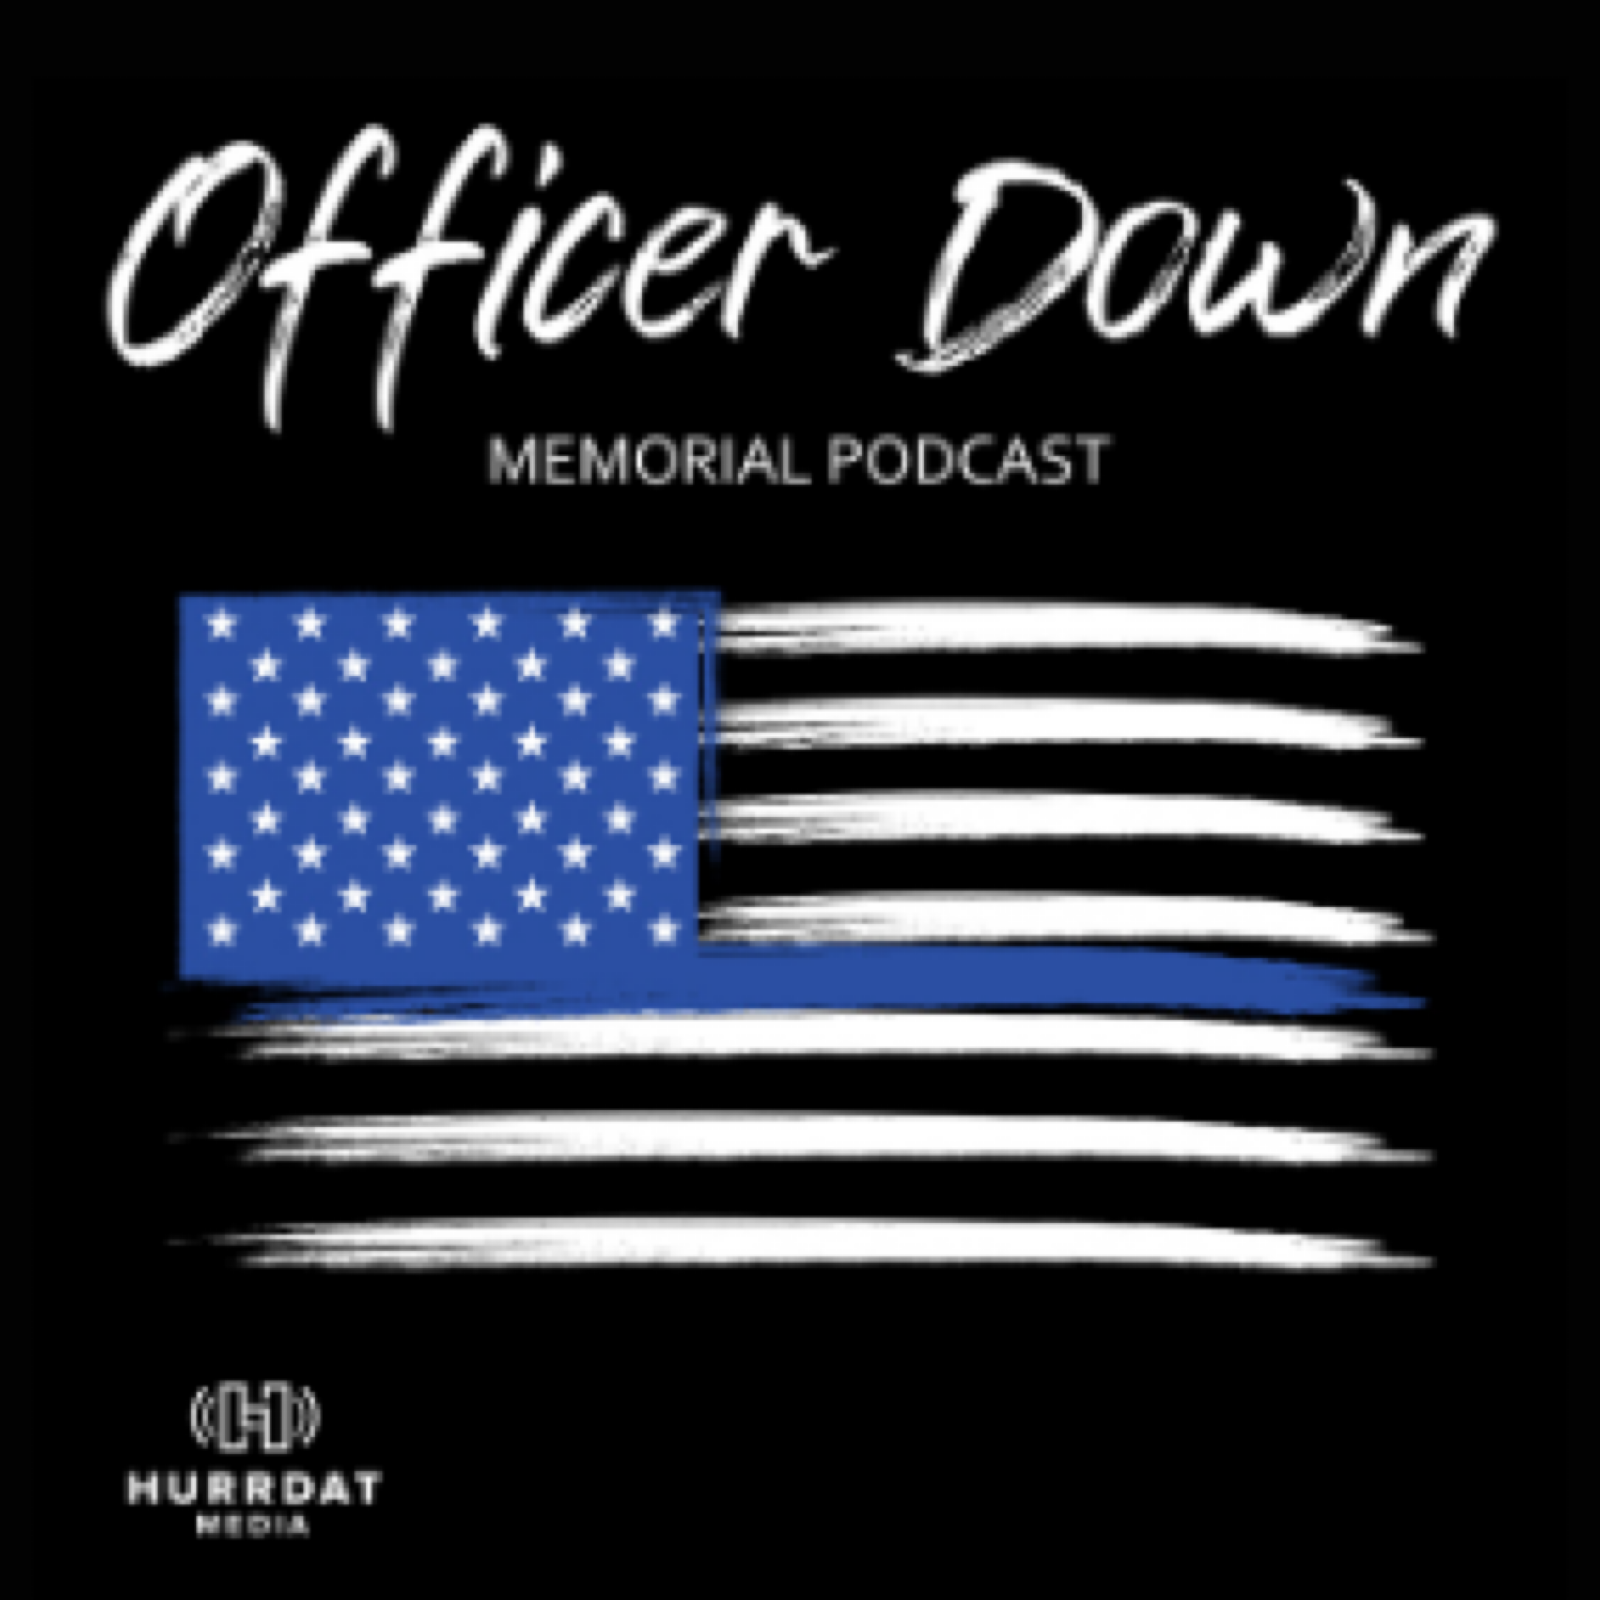 Officer Down Memorial Podcast show art